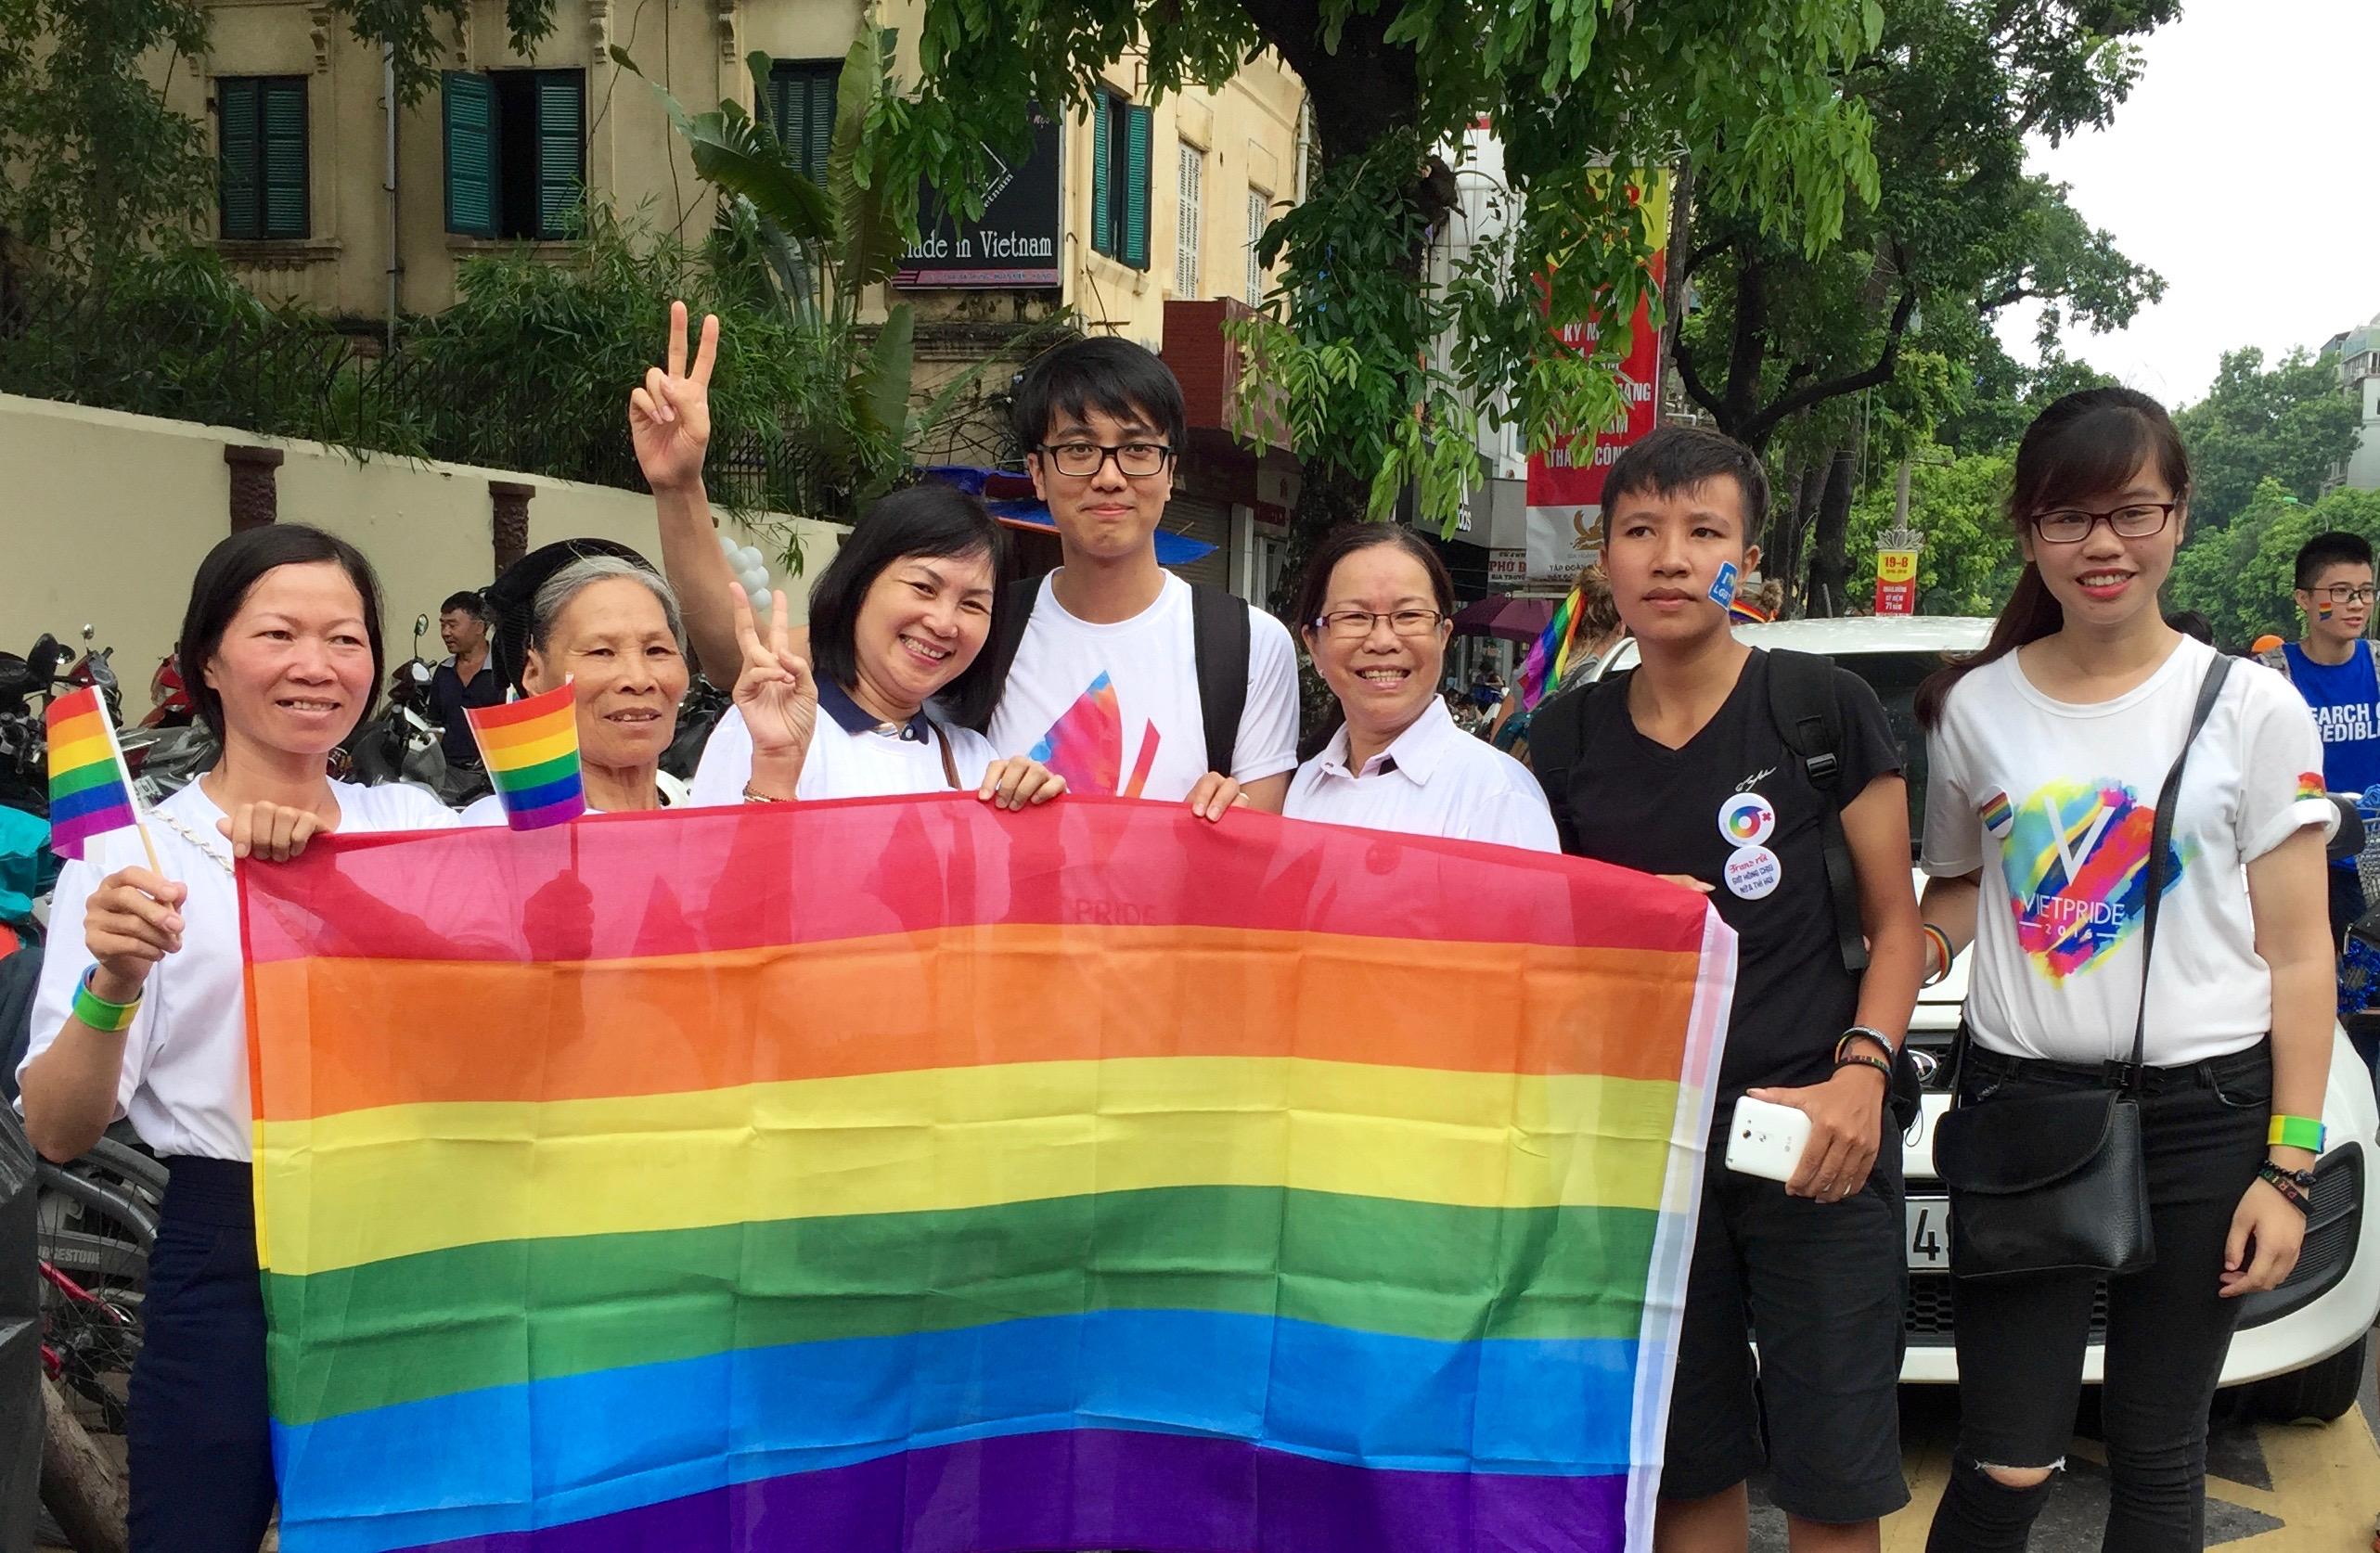 File:Viet Pride 2016 in Hanoi (28511018444).jpg - Wikimedia Commons